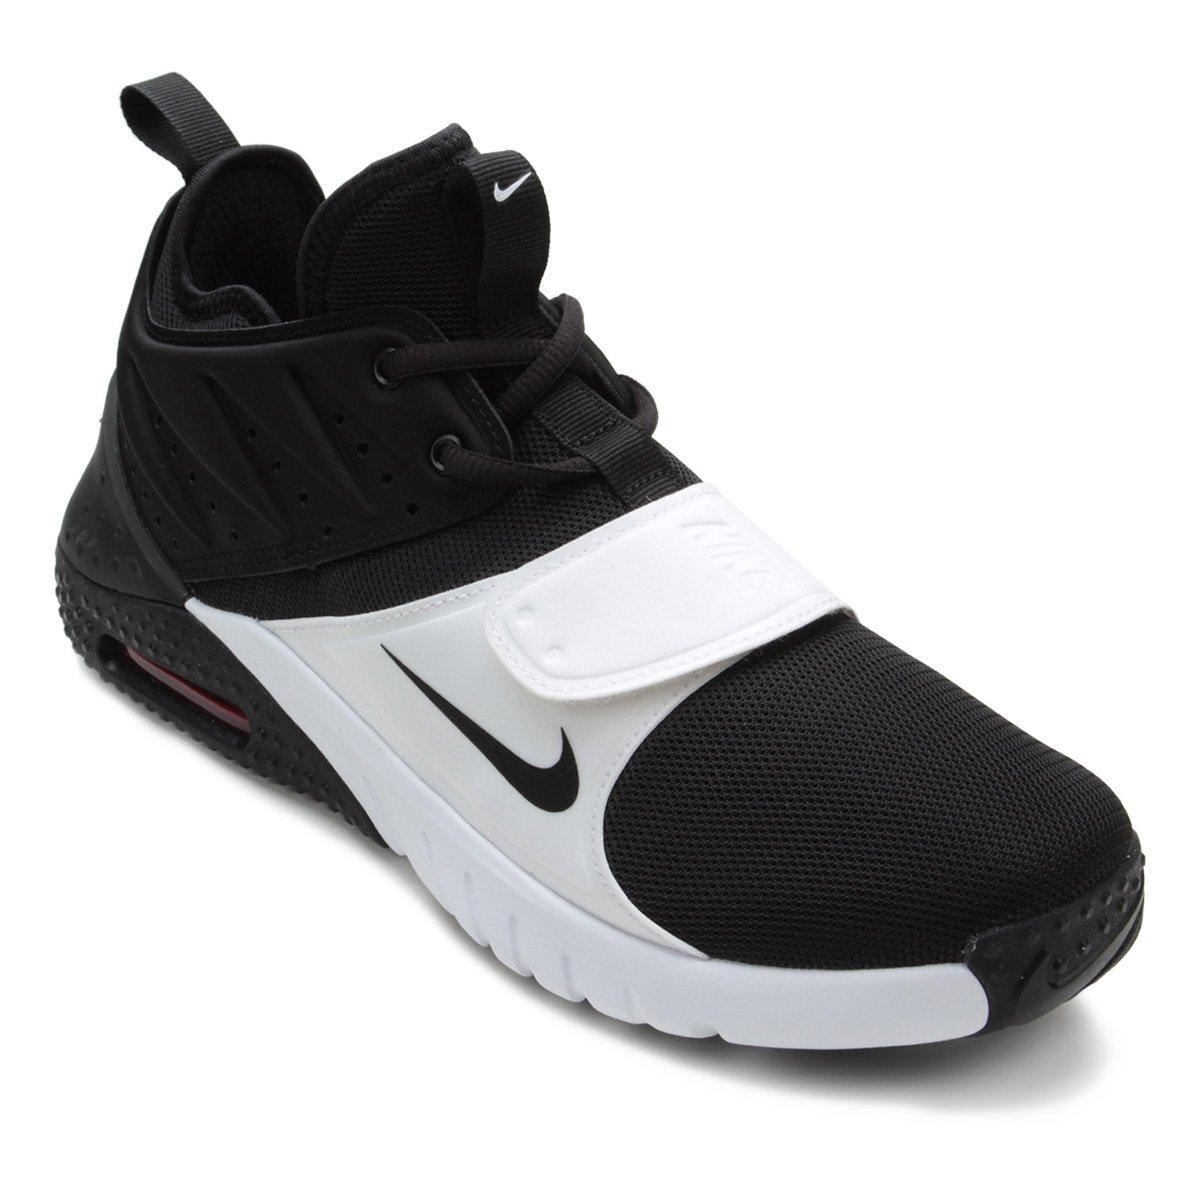 7bd36b32fd2c4 48%OFF Tênis Nike Air Max Trainer 1 Masculino